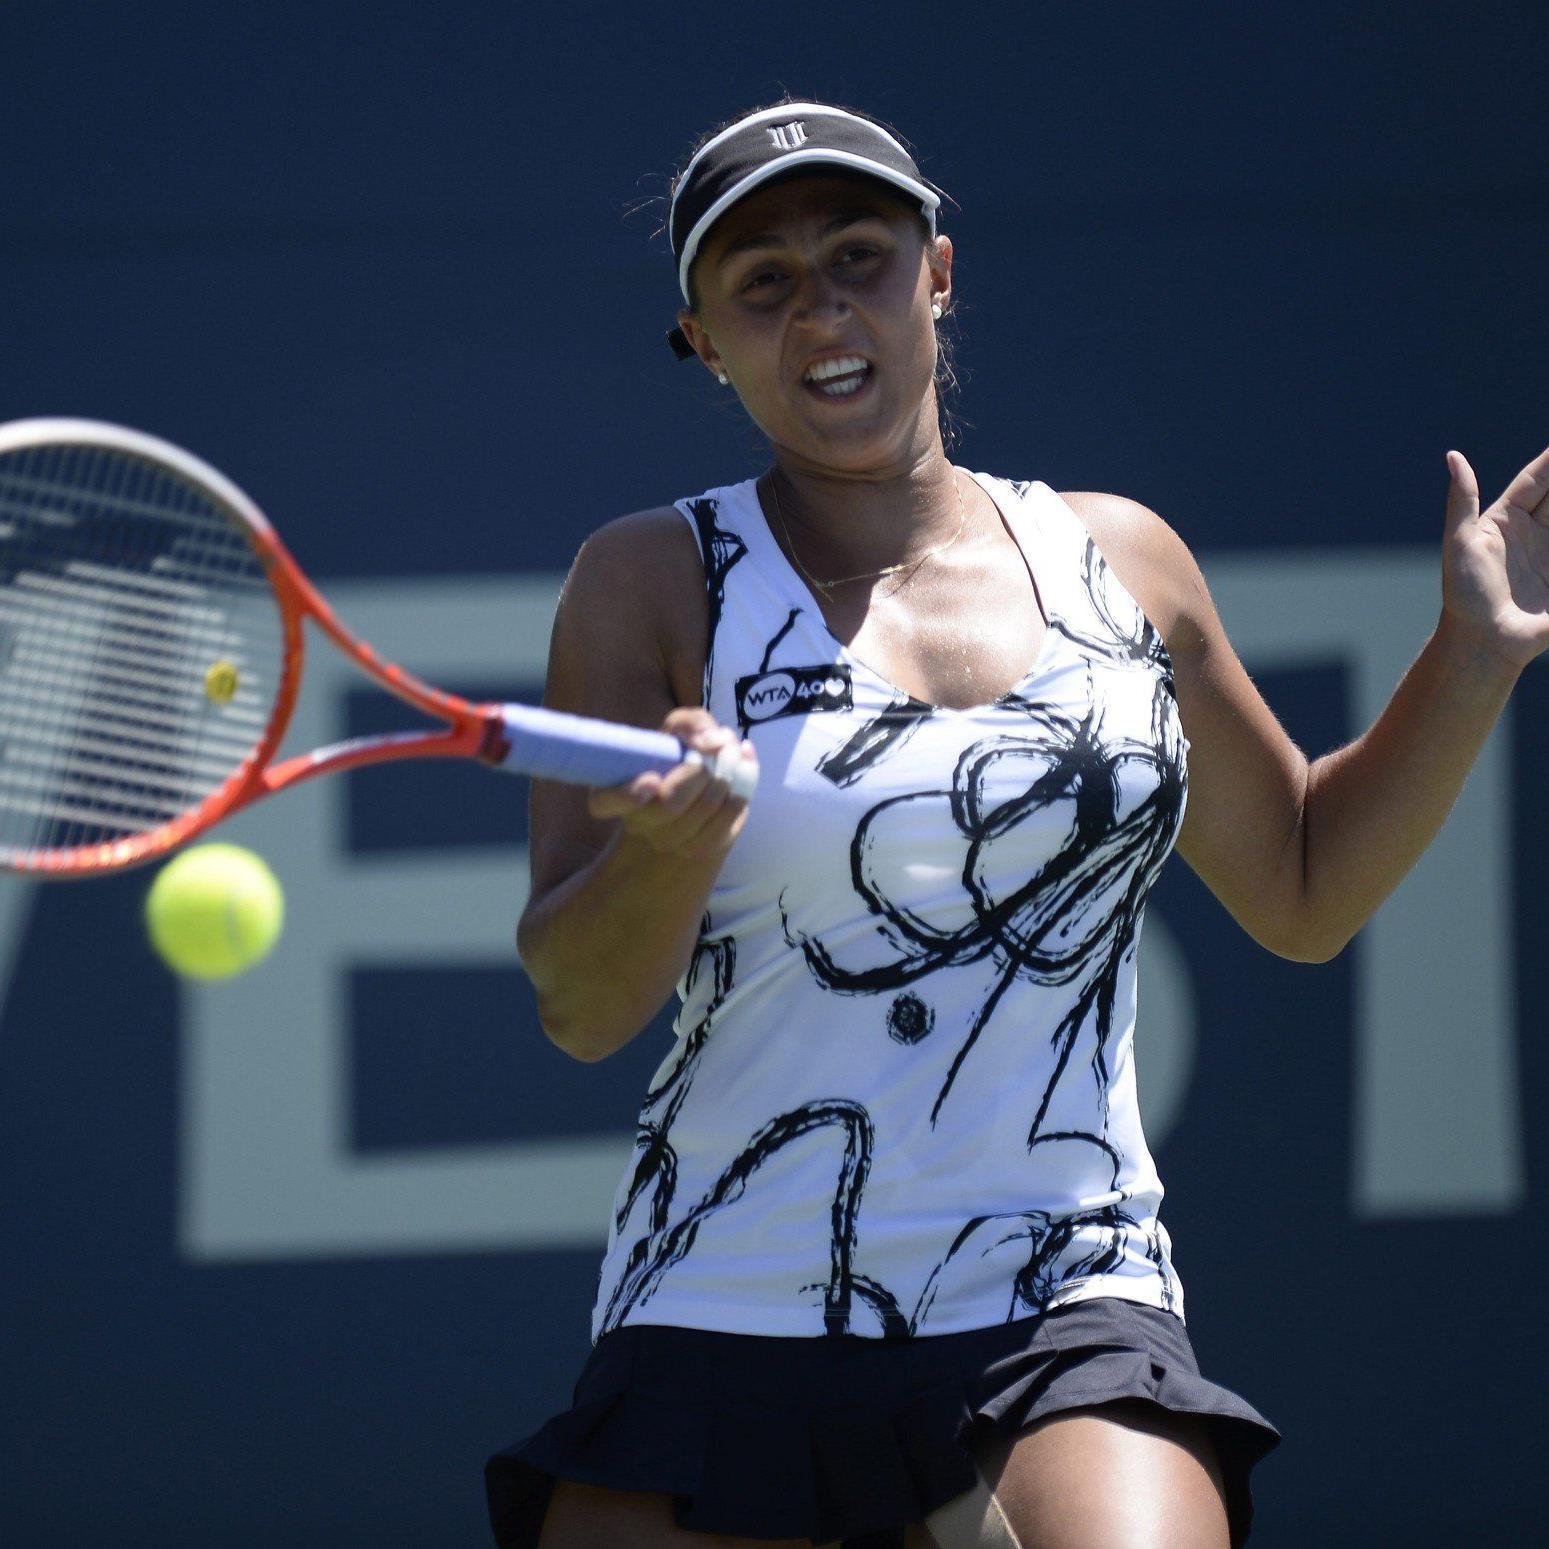 Tamira Paszek kassiert 0:6,0:6-Niederlage gegen Daniela Hantuchova.